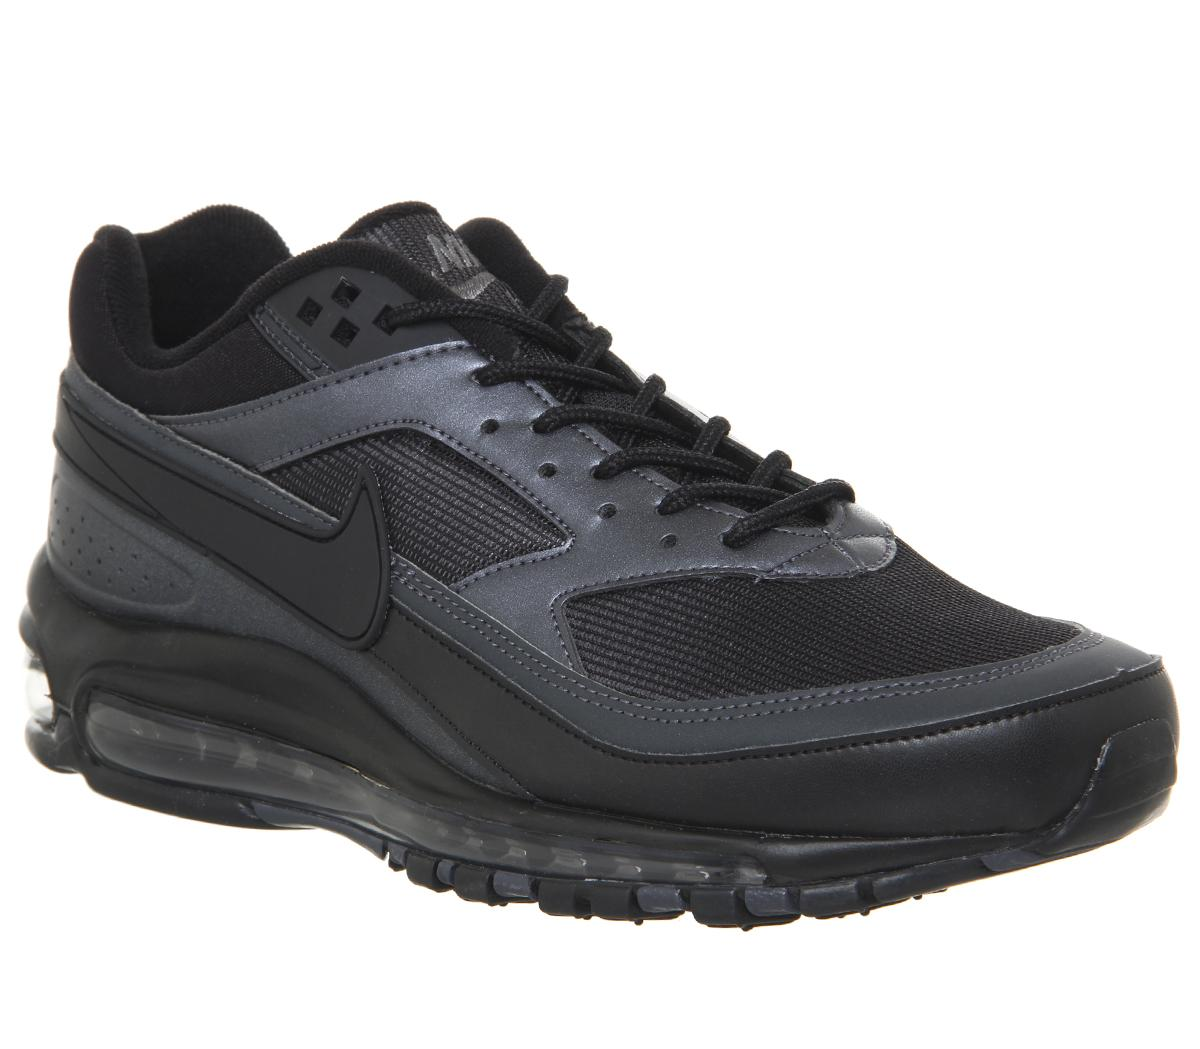 Terapia Unión huella  Nike Air Max 97 /BW Trainers Black Metallic Hematite - His trainers